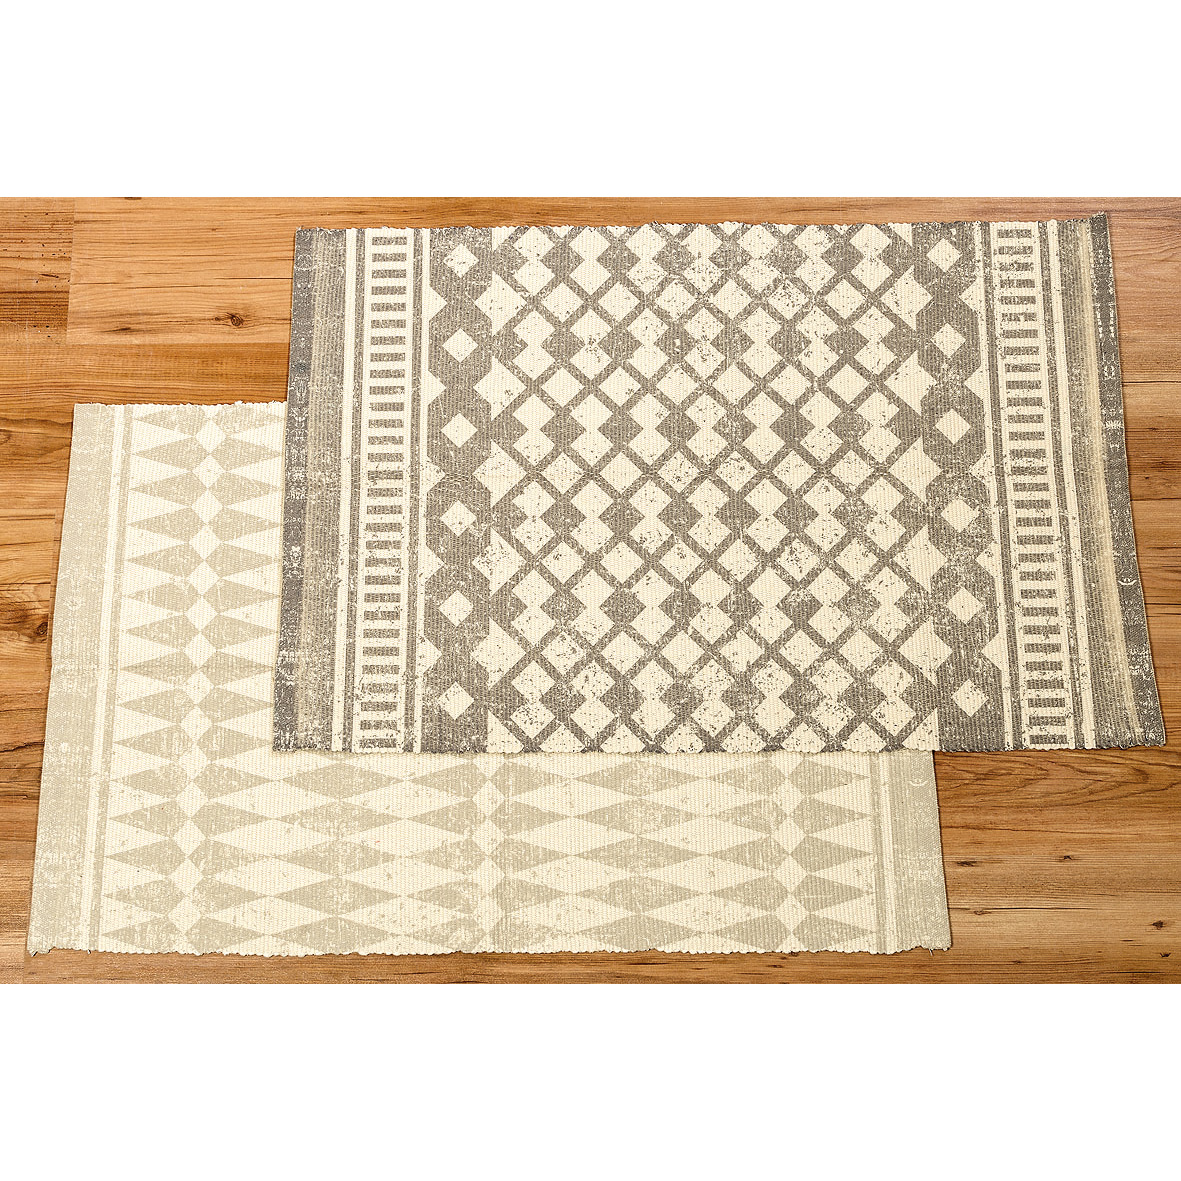 Teppich mit Ethnomuster 90cm creme  grau  035482